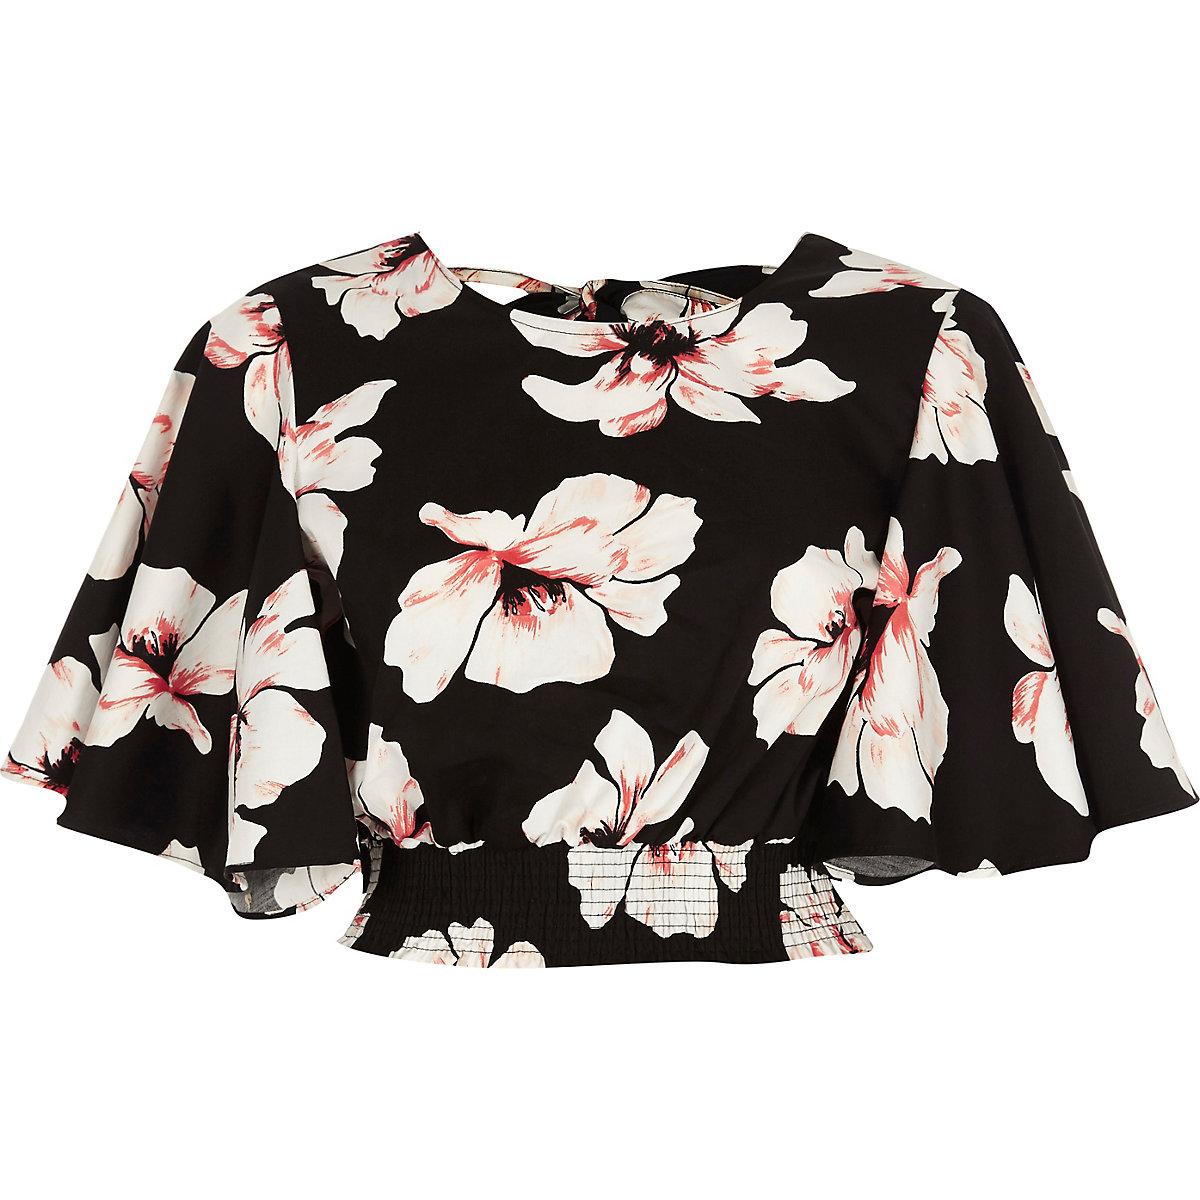 Black floral frill sleeve crop top